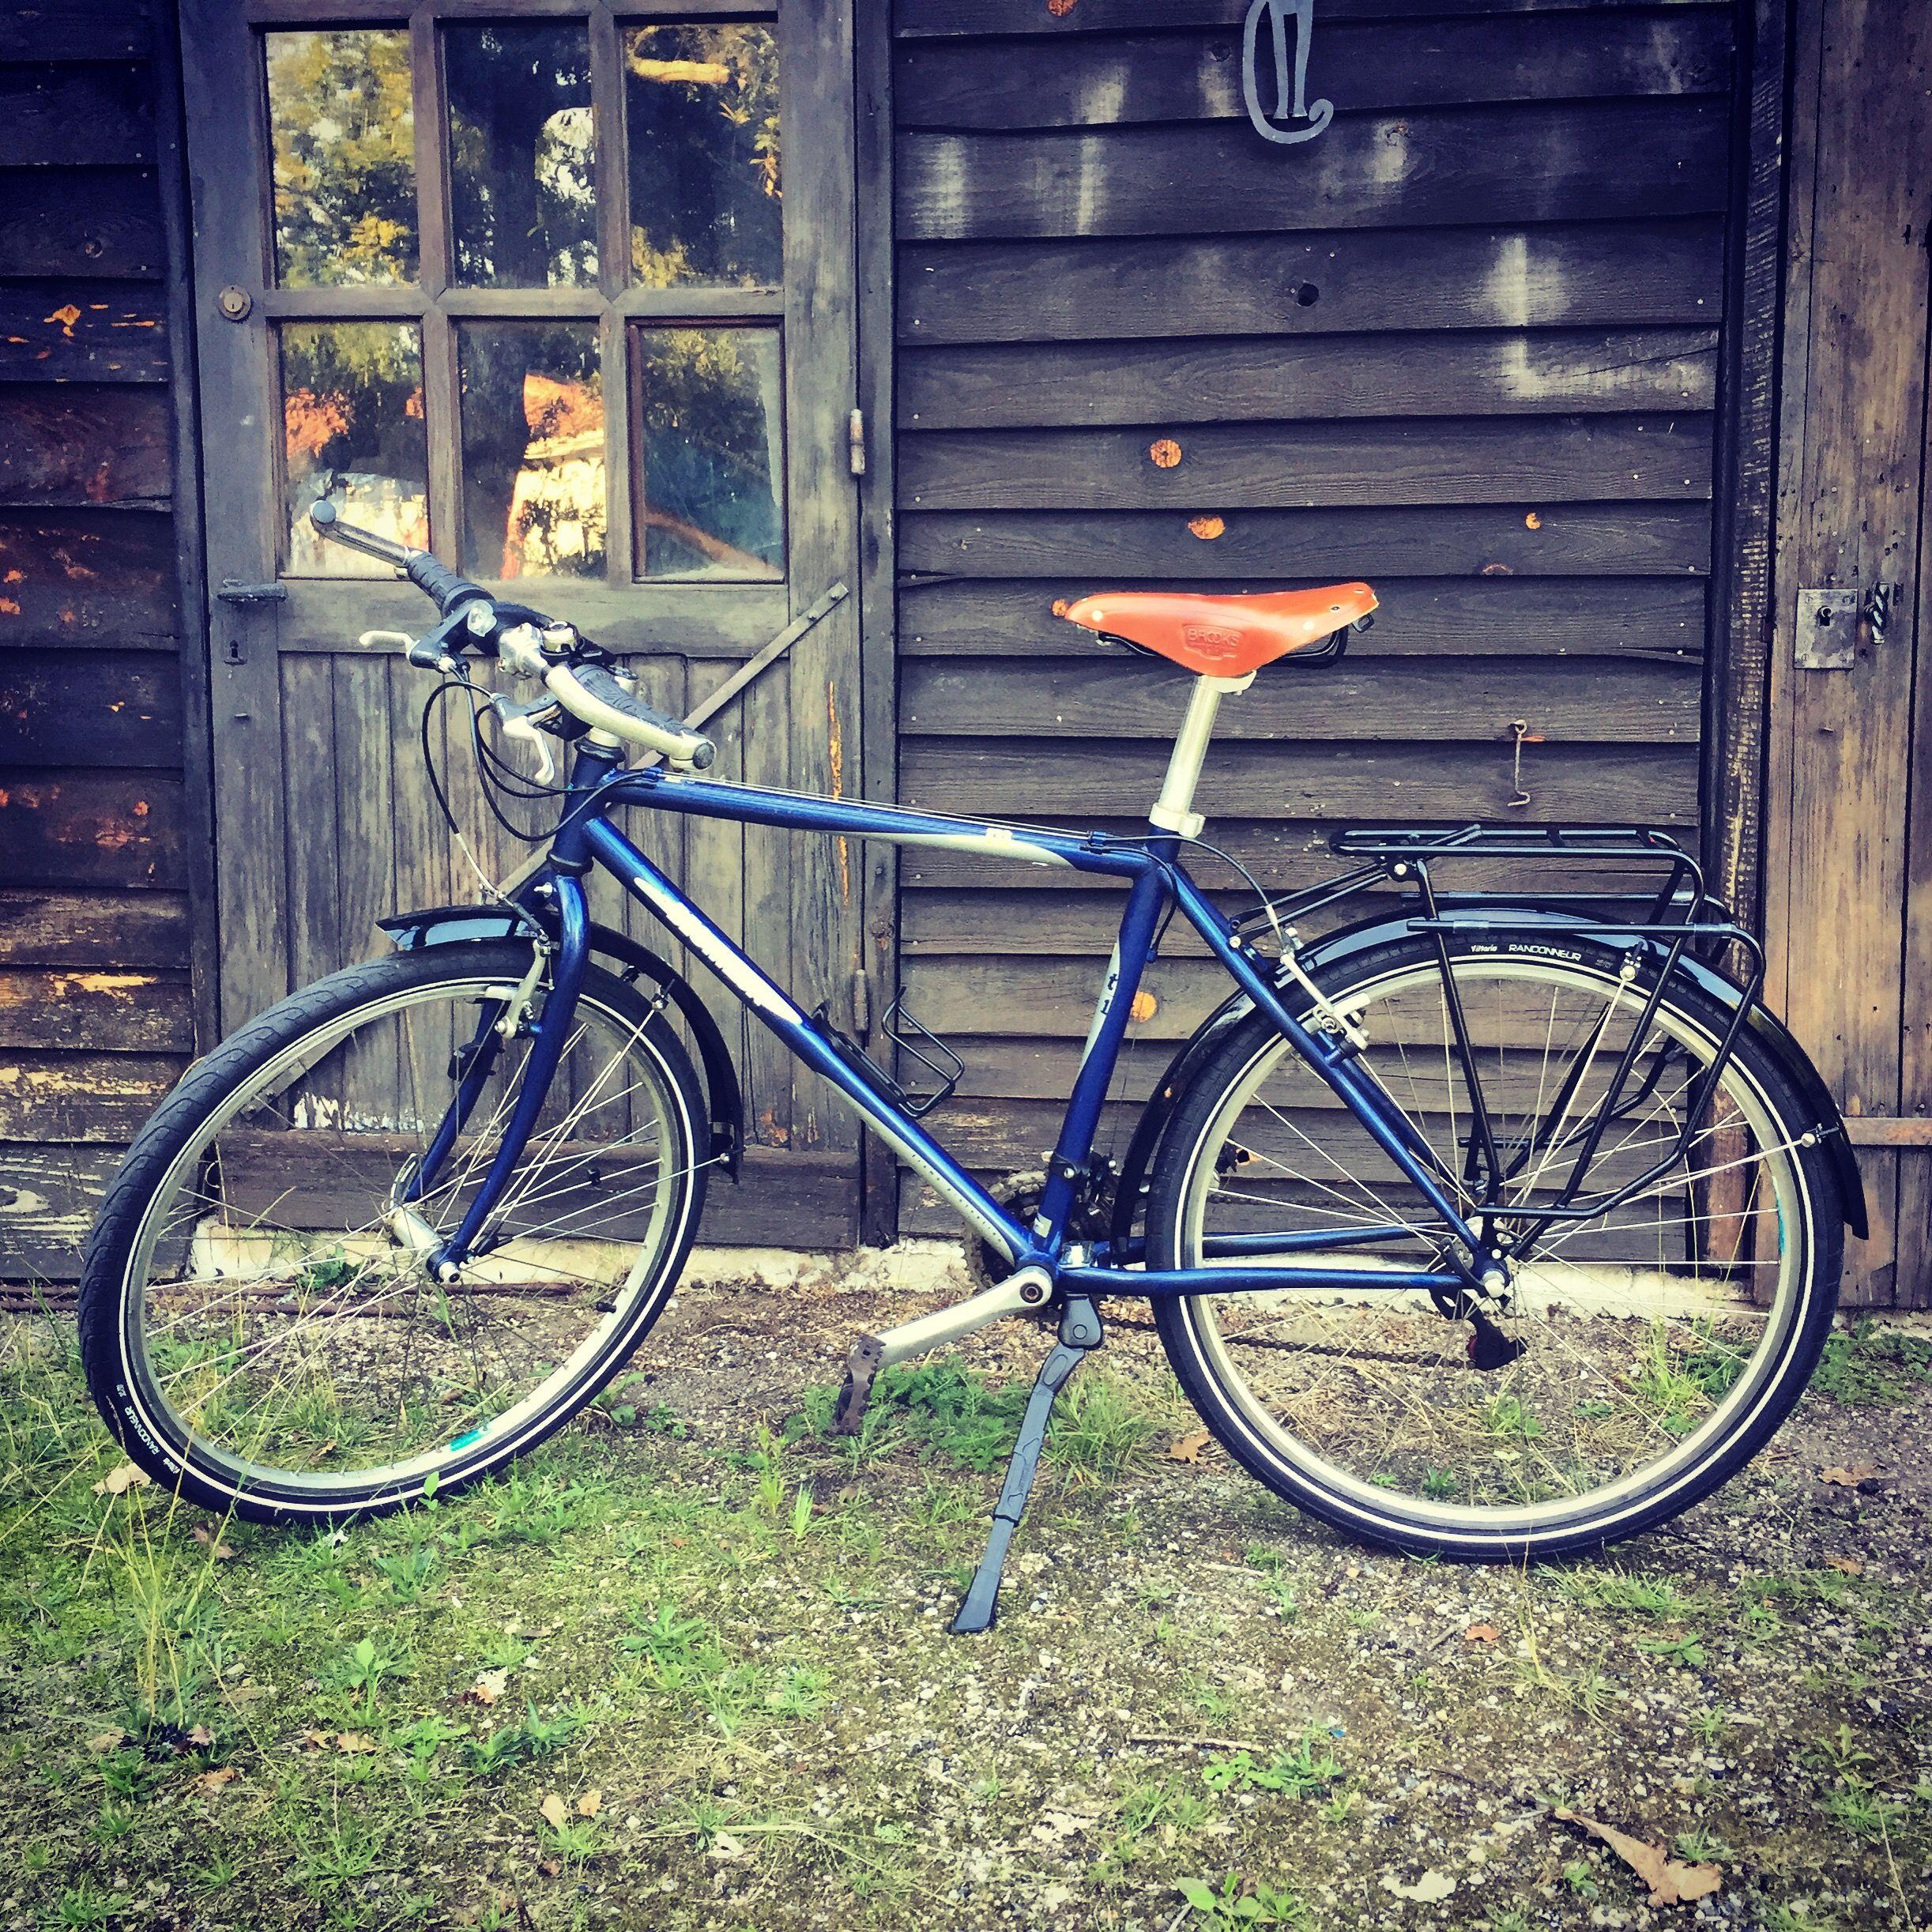 Mon Vieux Vtt Decathlon Des Annees 90 Transforme En Velo De Randonnee Bicycle Cyclotourisme Velorando Trekbikes Vtt Decathlon Velo Randonnee Vtt Vintage